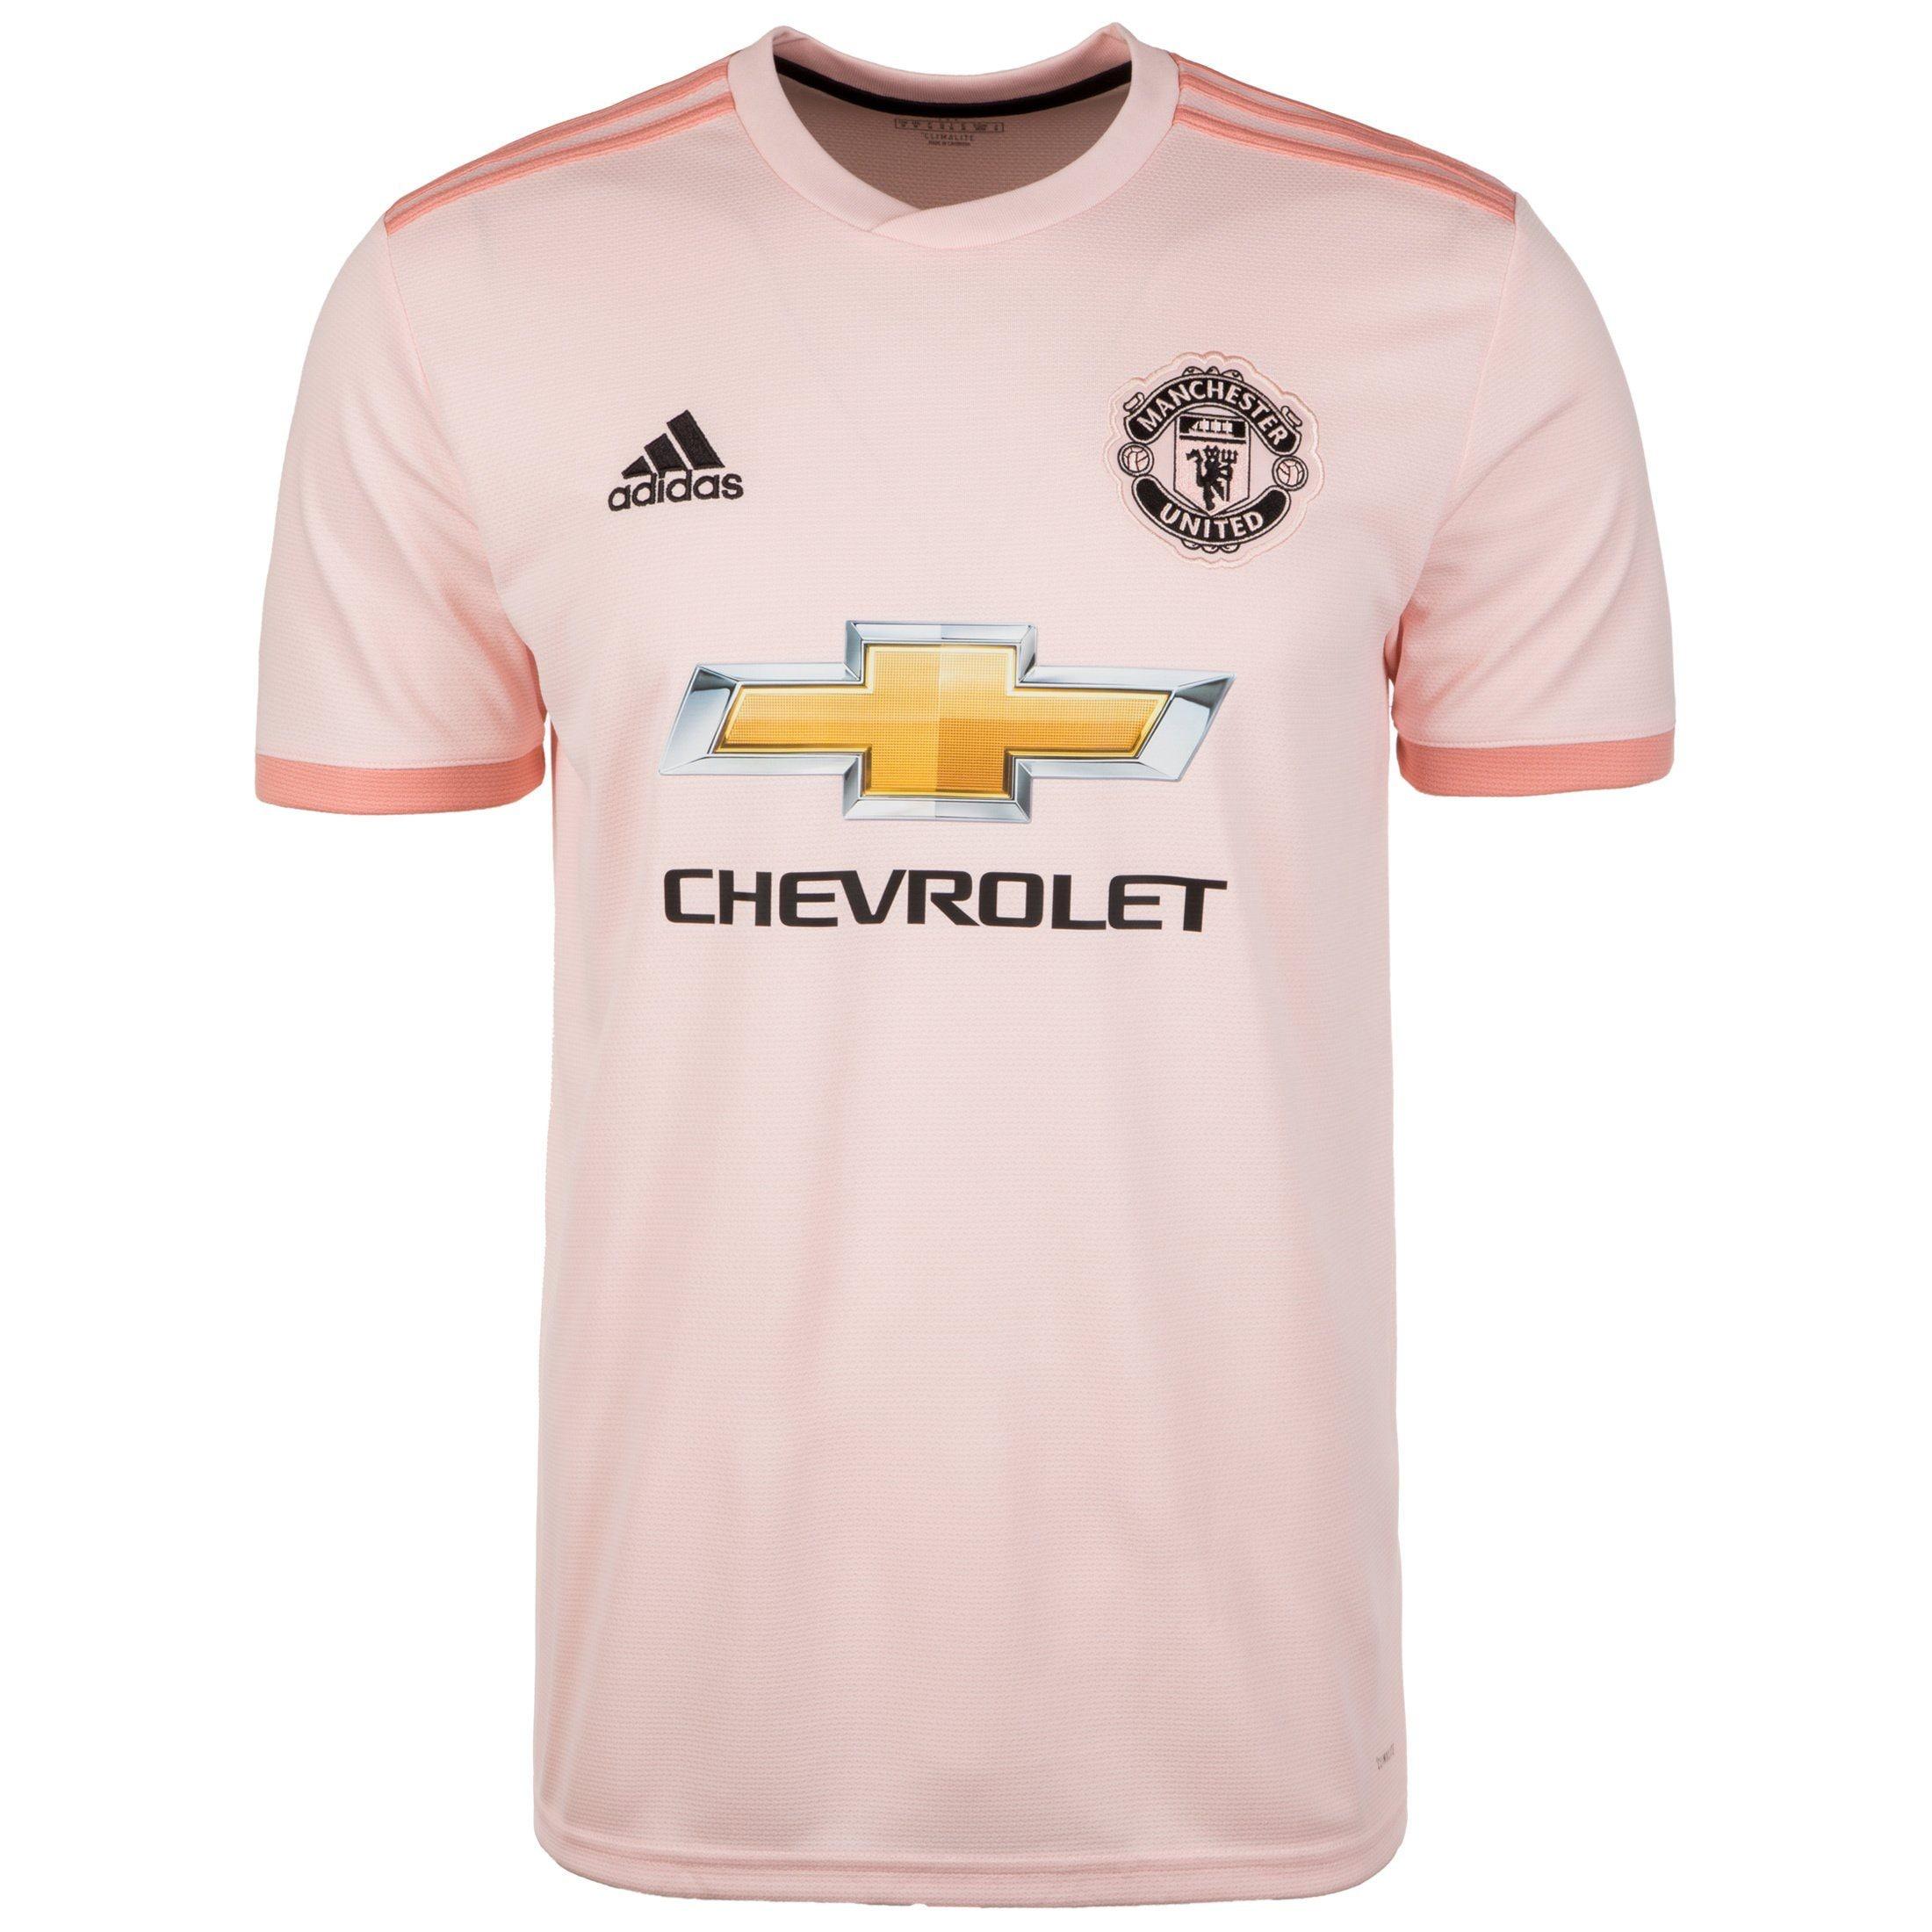 adidas Performance Fußballtrikot Manchester United 18/19 Auswärts | Sportbekleidung > Trikots | Rosa | Trikot - Ab | Adidas Performance